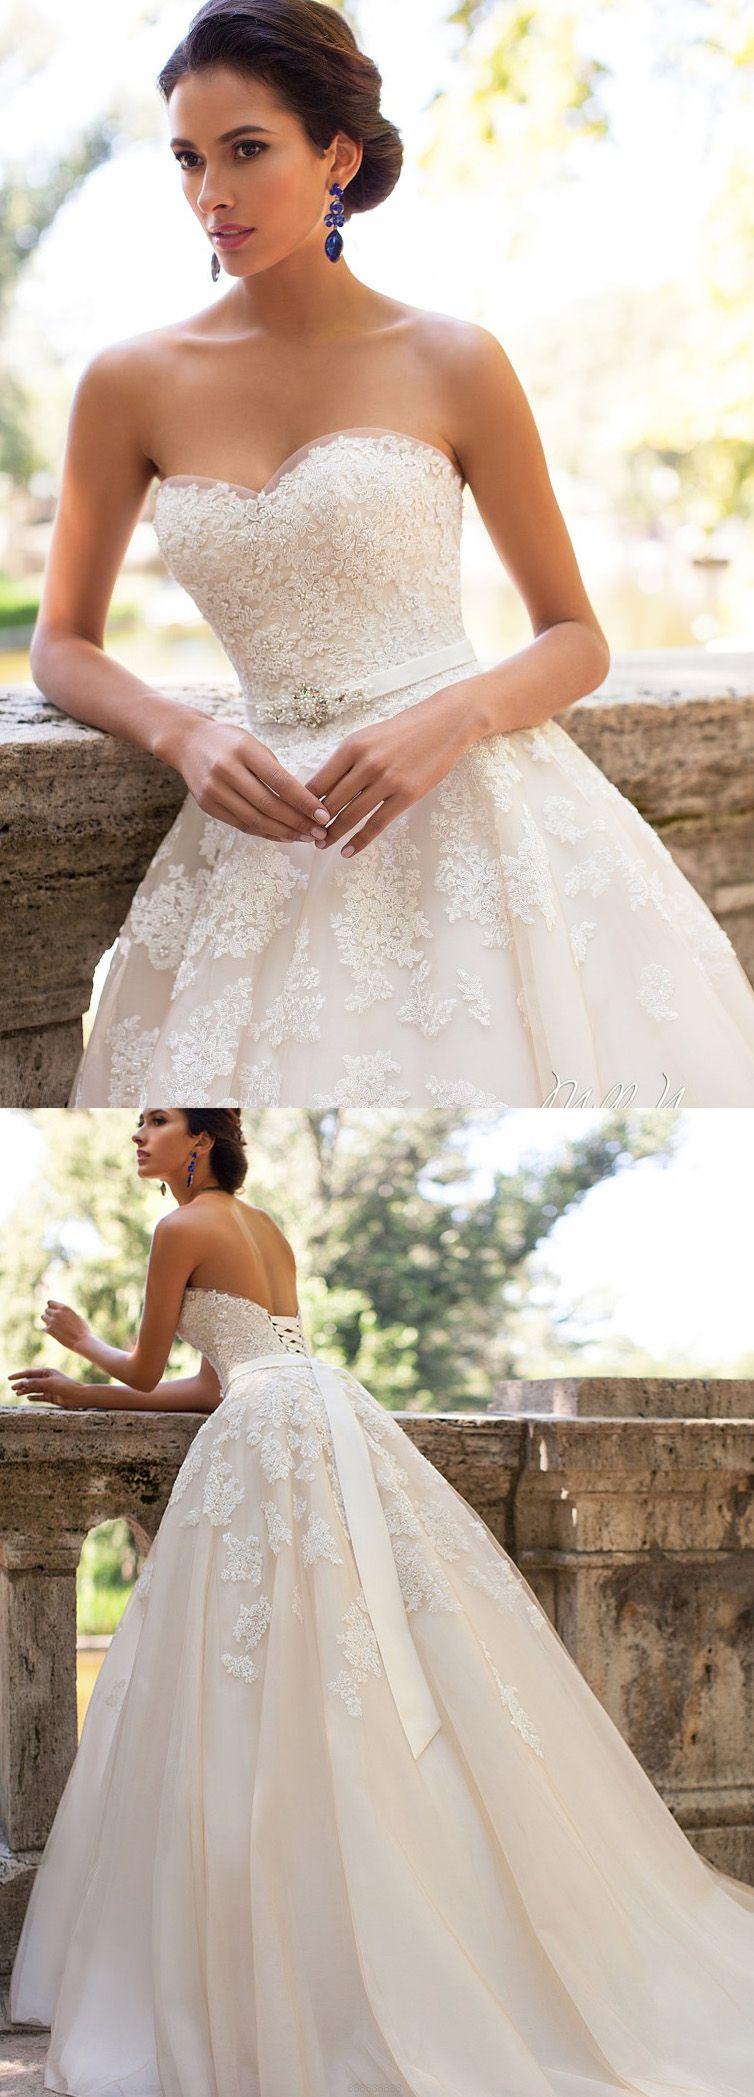 Princess Wedding Dresses, Ivory Wedding Dresses, Long Wedding ...